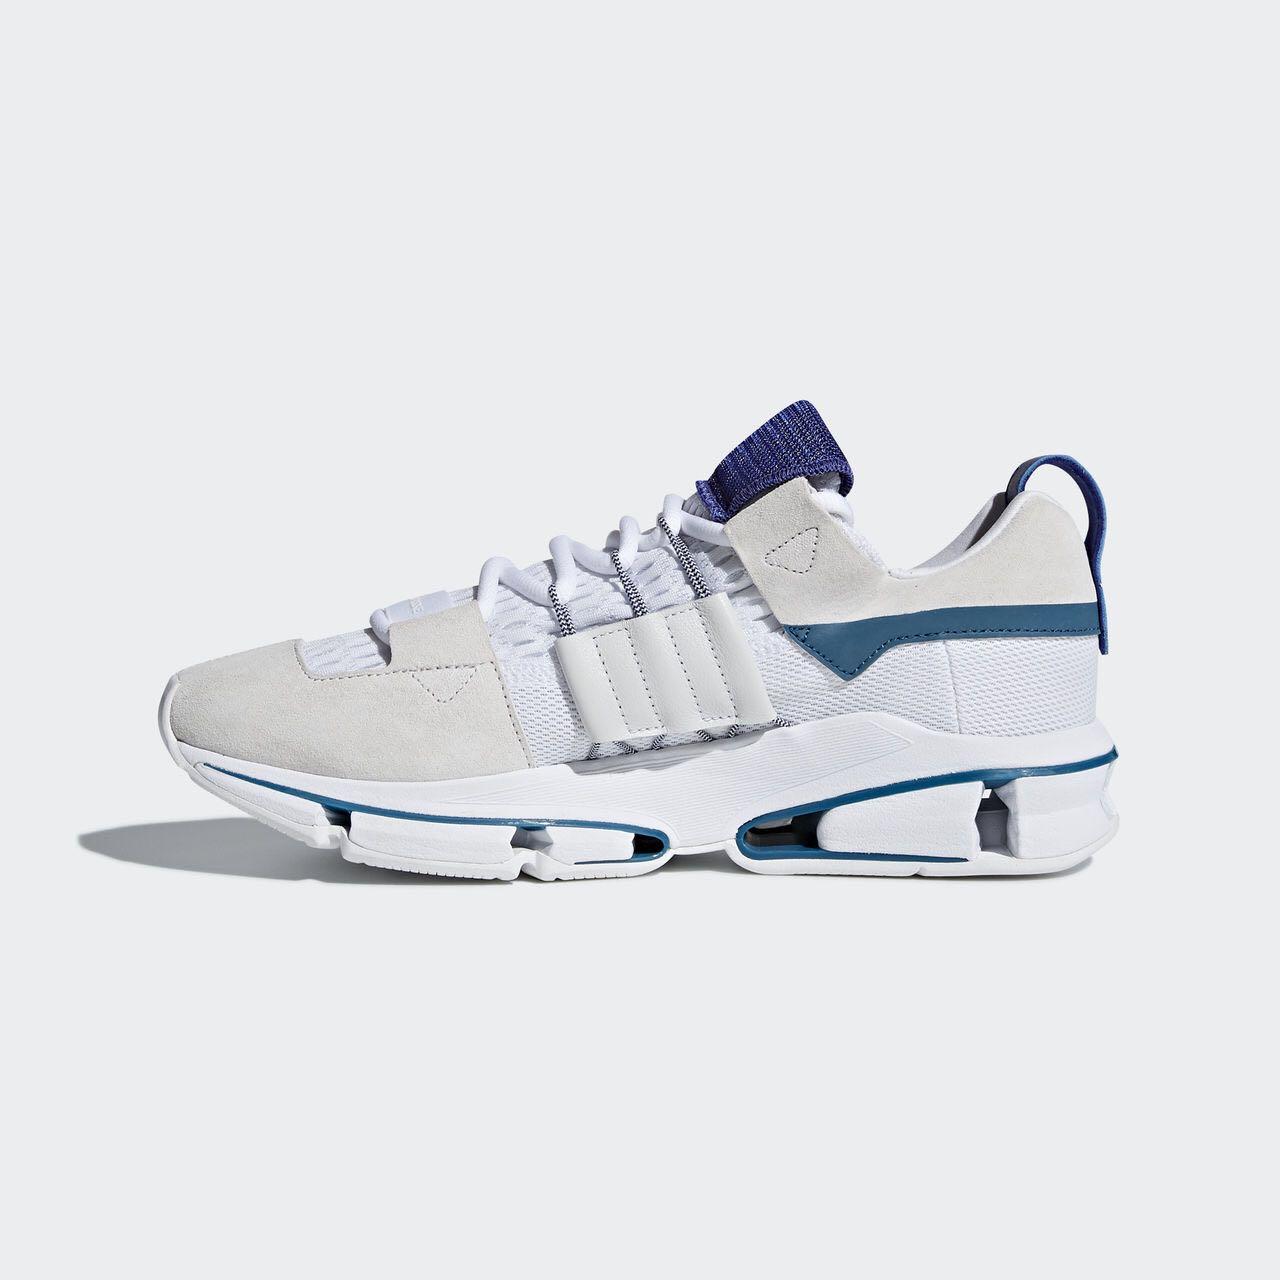 adidas Twinstrike ADV 货号: CM8096 - 莆田鞋